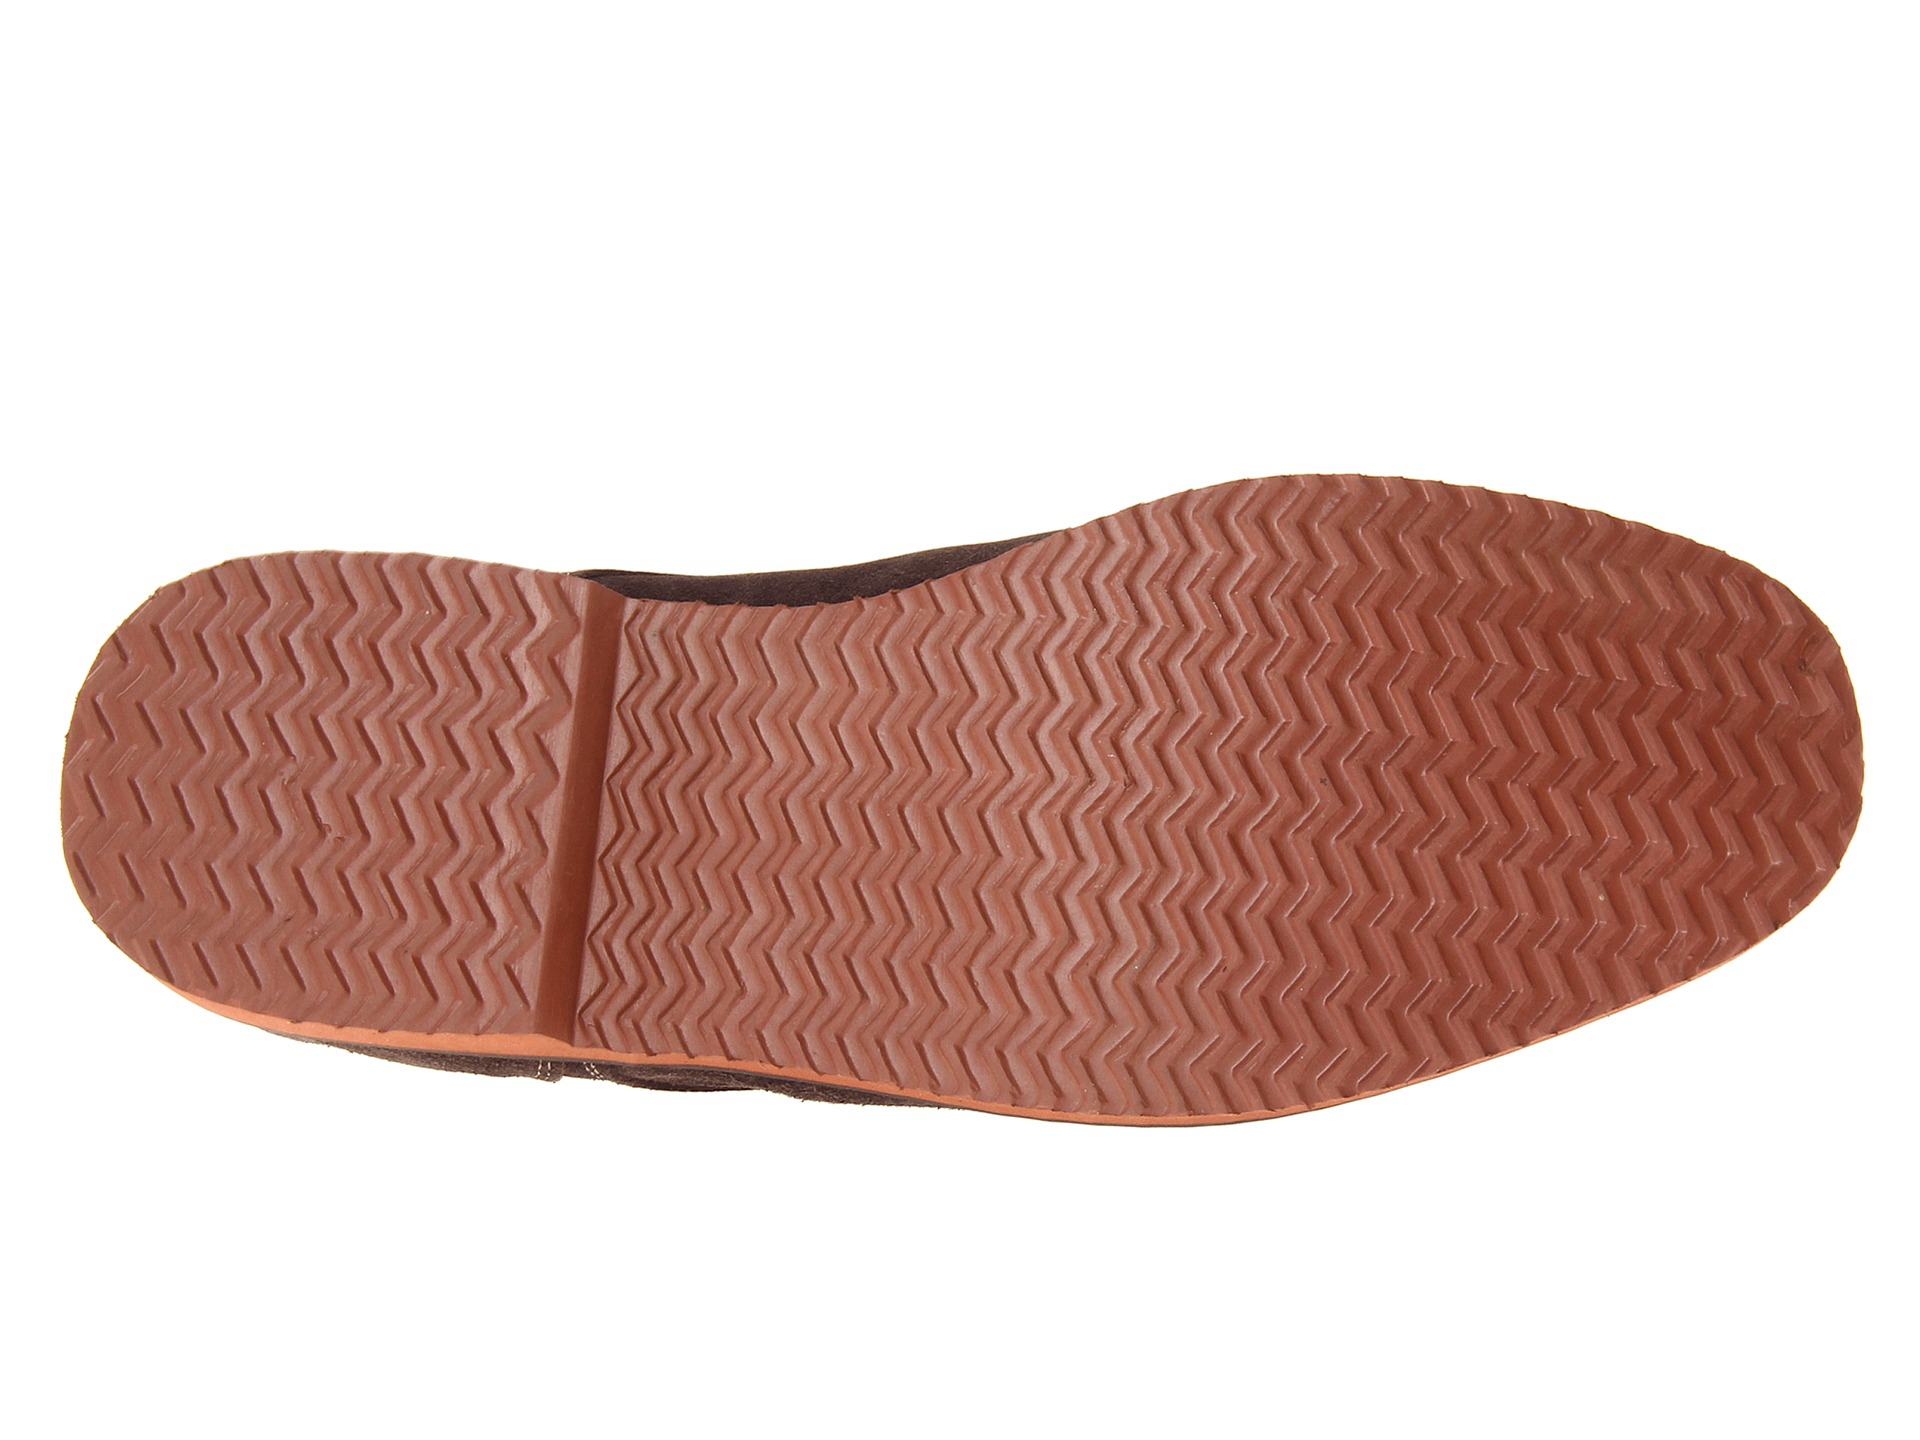 Nunn Bush Woodbury Plain Toe Casual Chukka Boot Brown